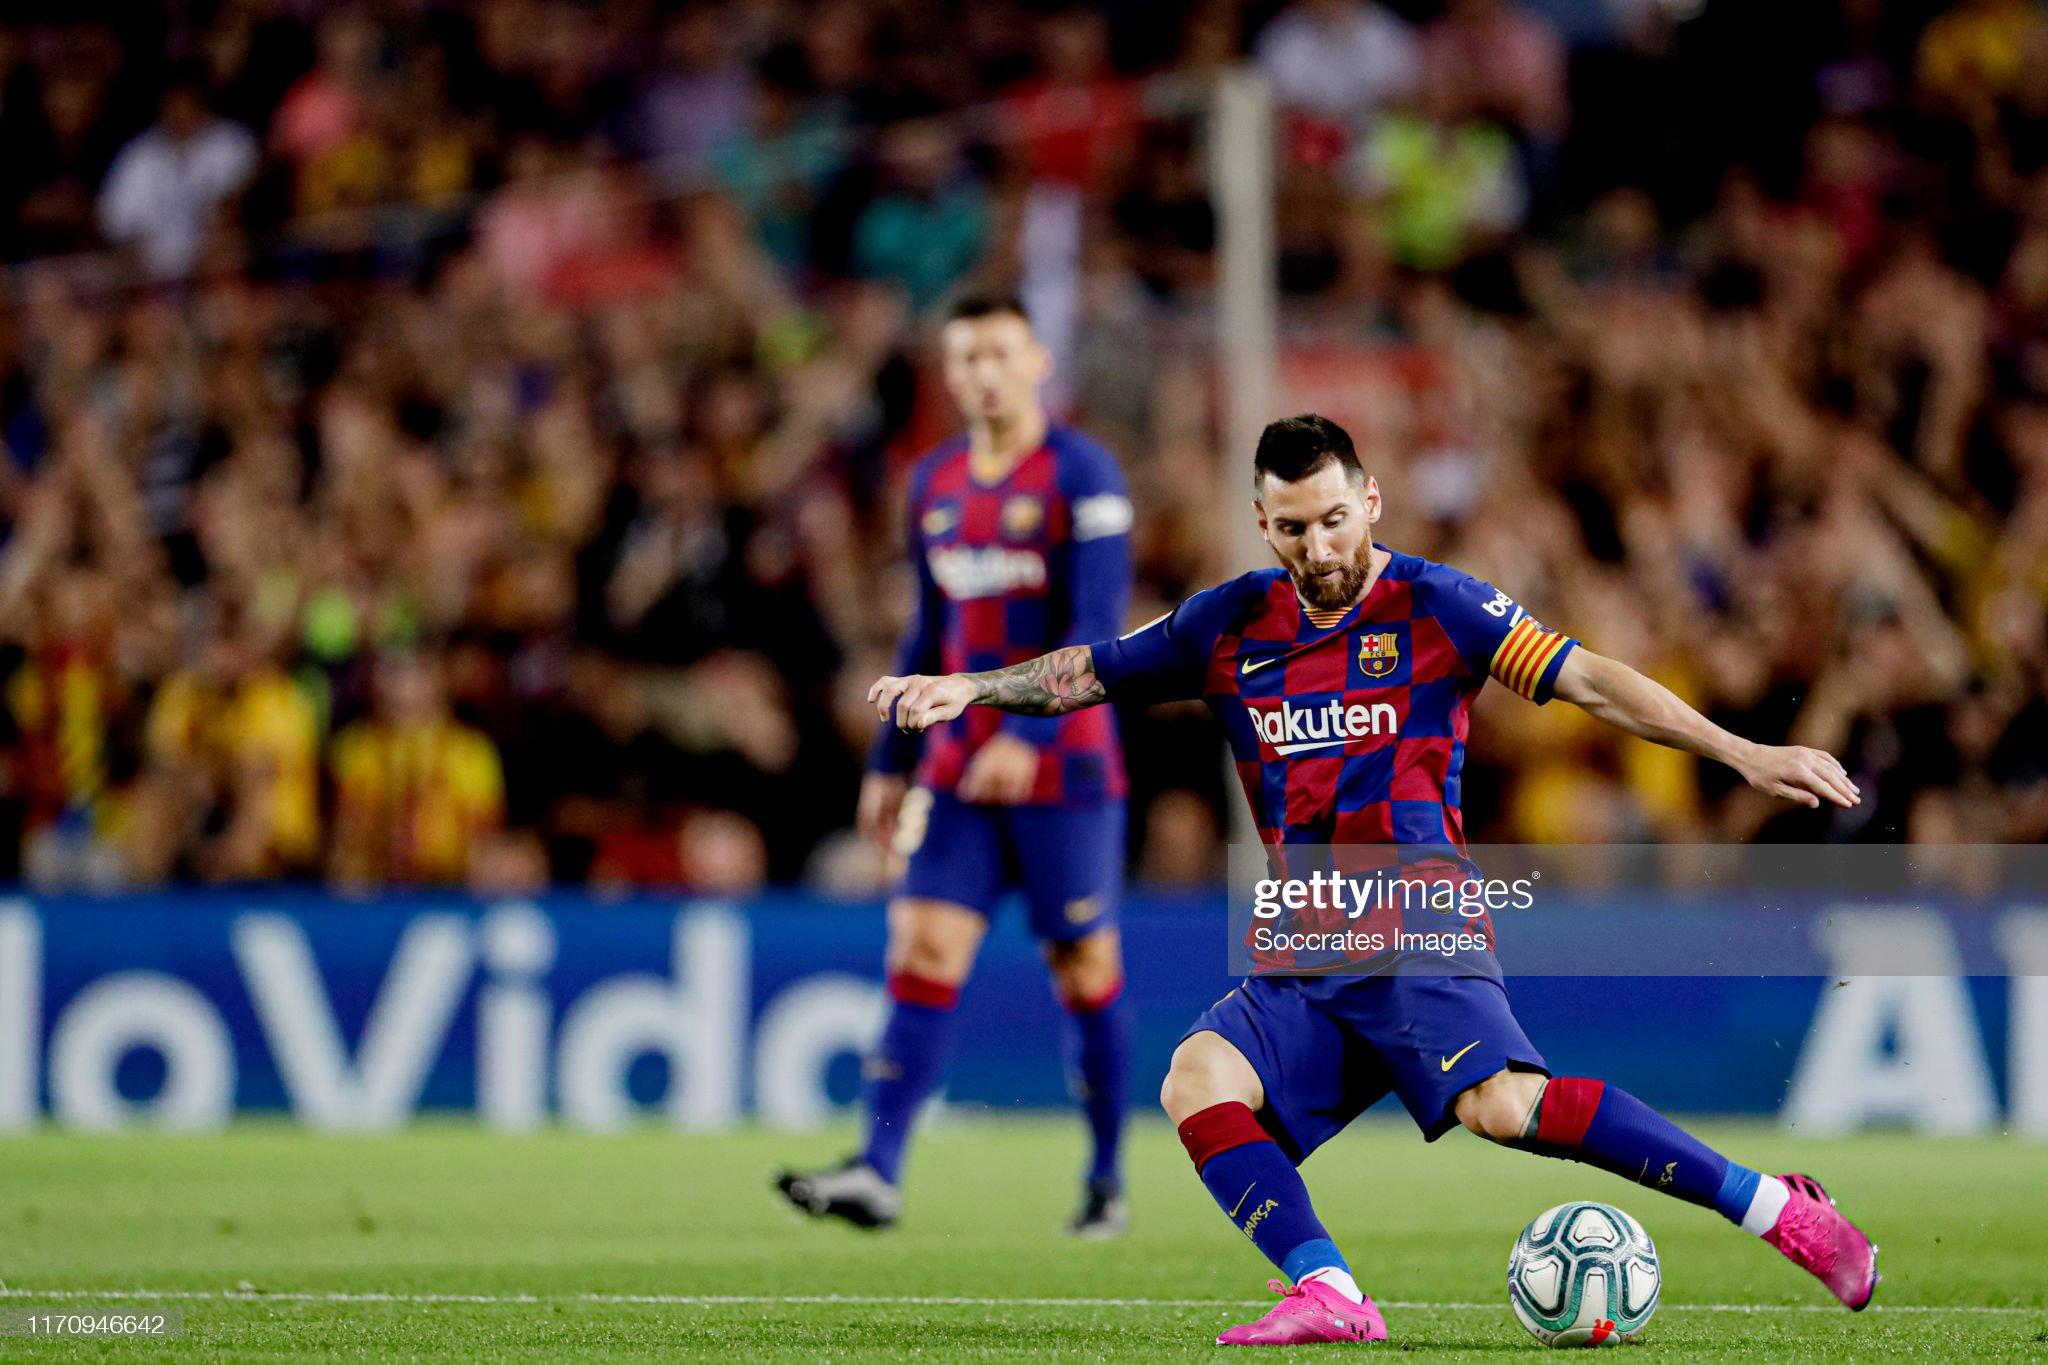 صور مباراة : برشلونة - فياريال 2-1 ( 24-09-2019 )  Lionel-messi-of-fc-barcelona-during-the-la-liga-santander-match-fc-picture-id1170946642?s=2048x2048